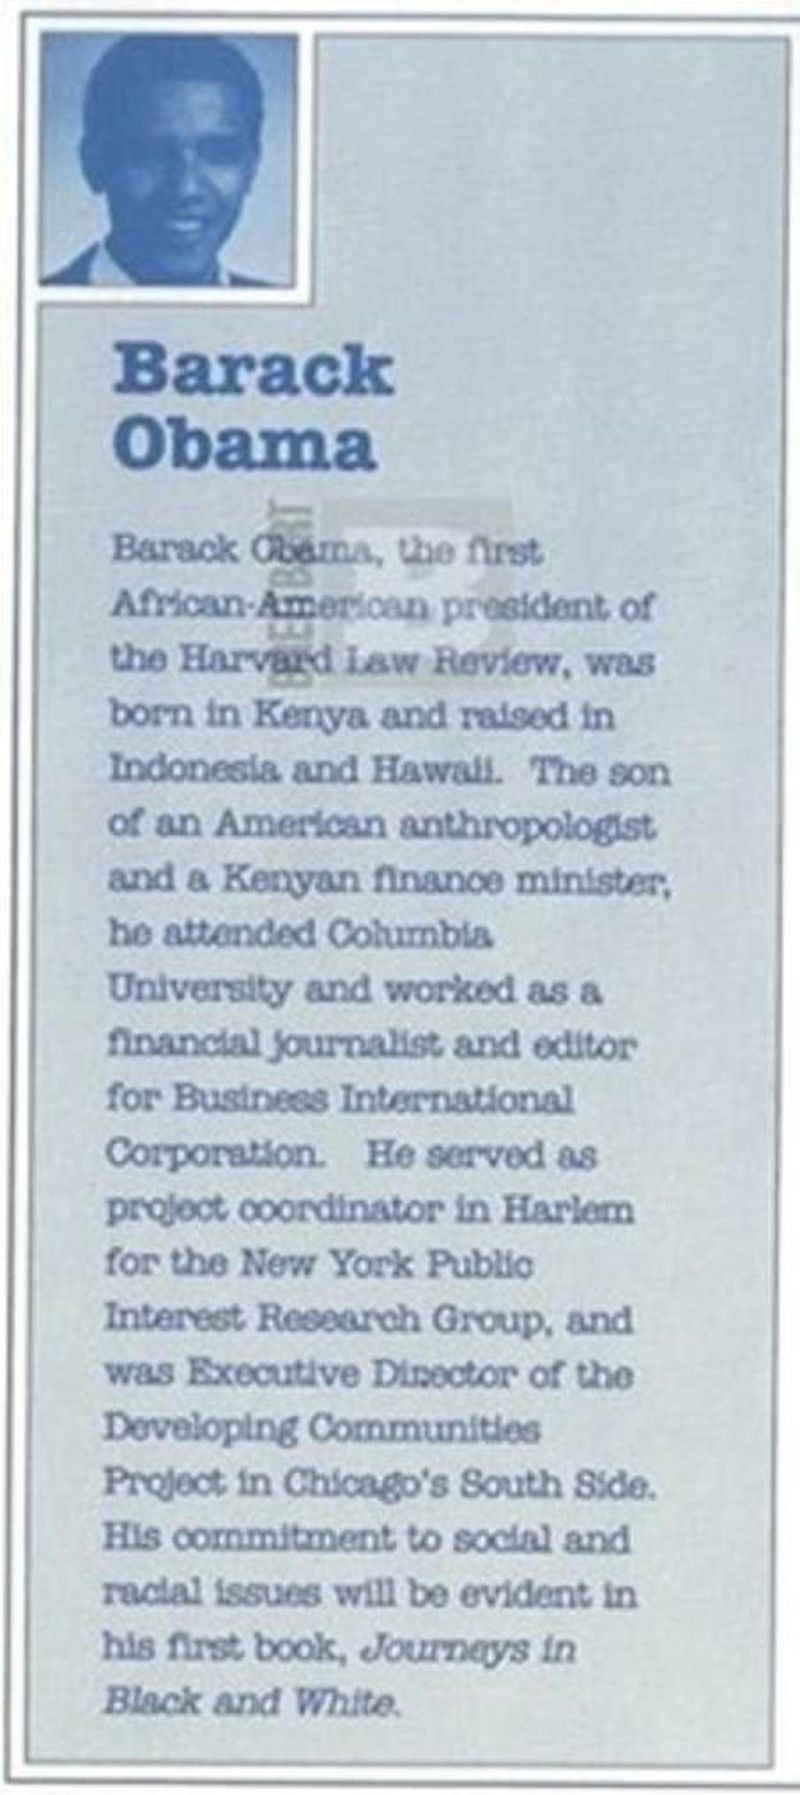 1991 Harvard Law Year Book4x